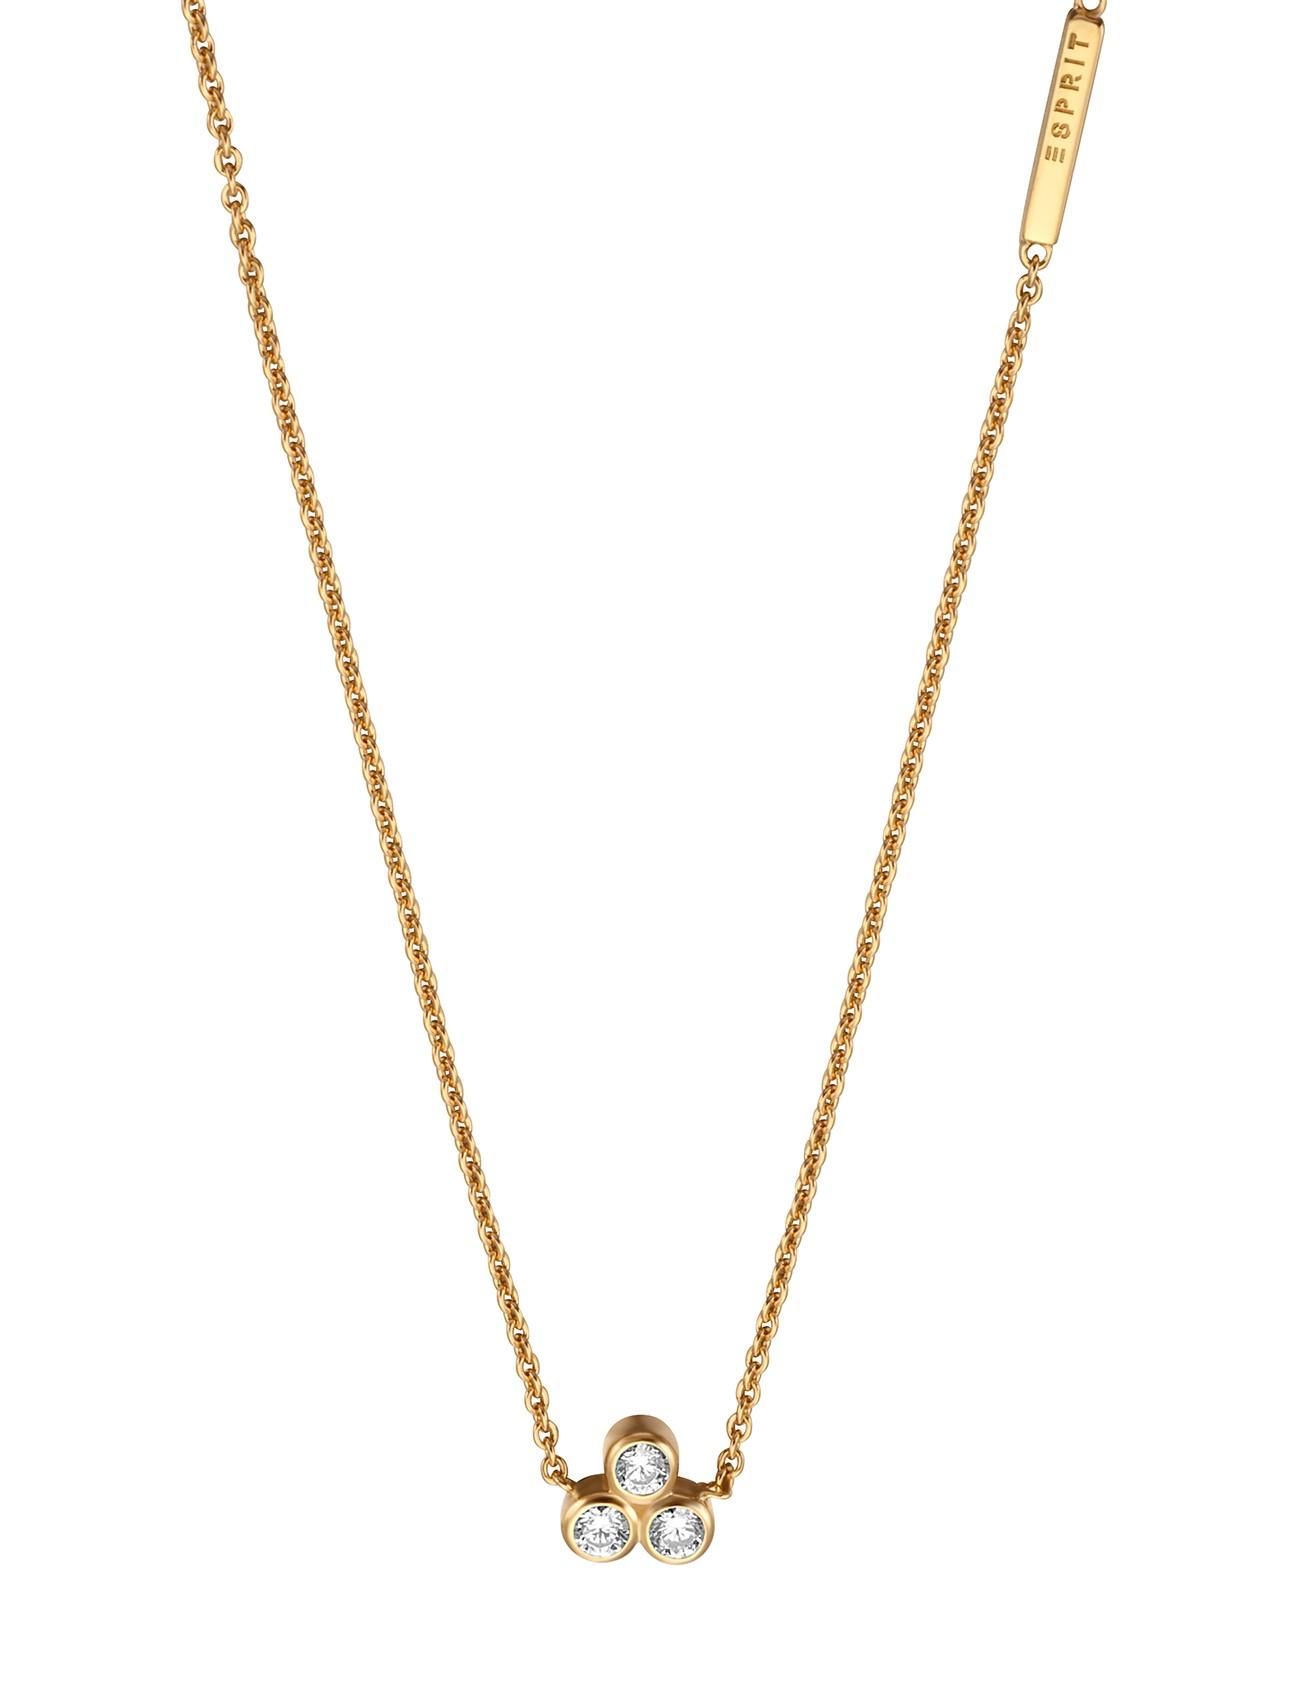 Esprit Ketting Play zilver goudkleurig 42-45 cm ESNL00191242